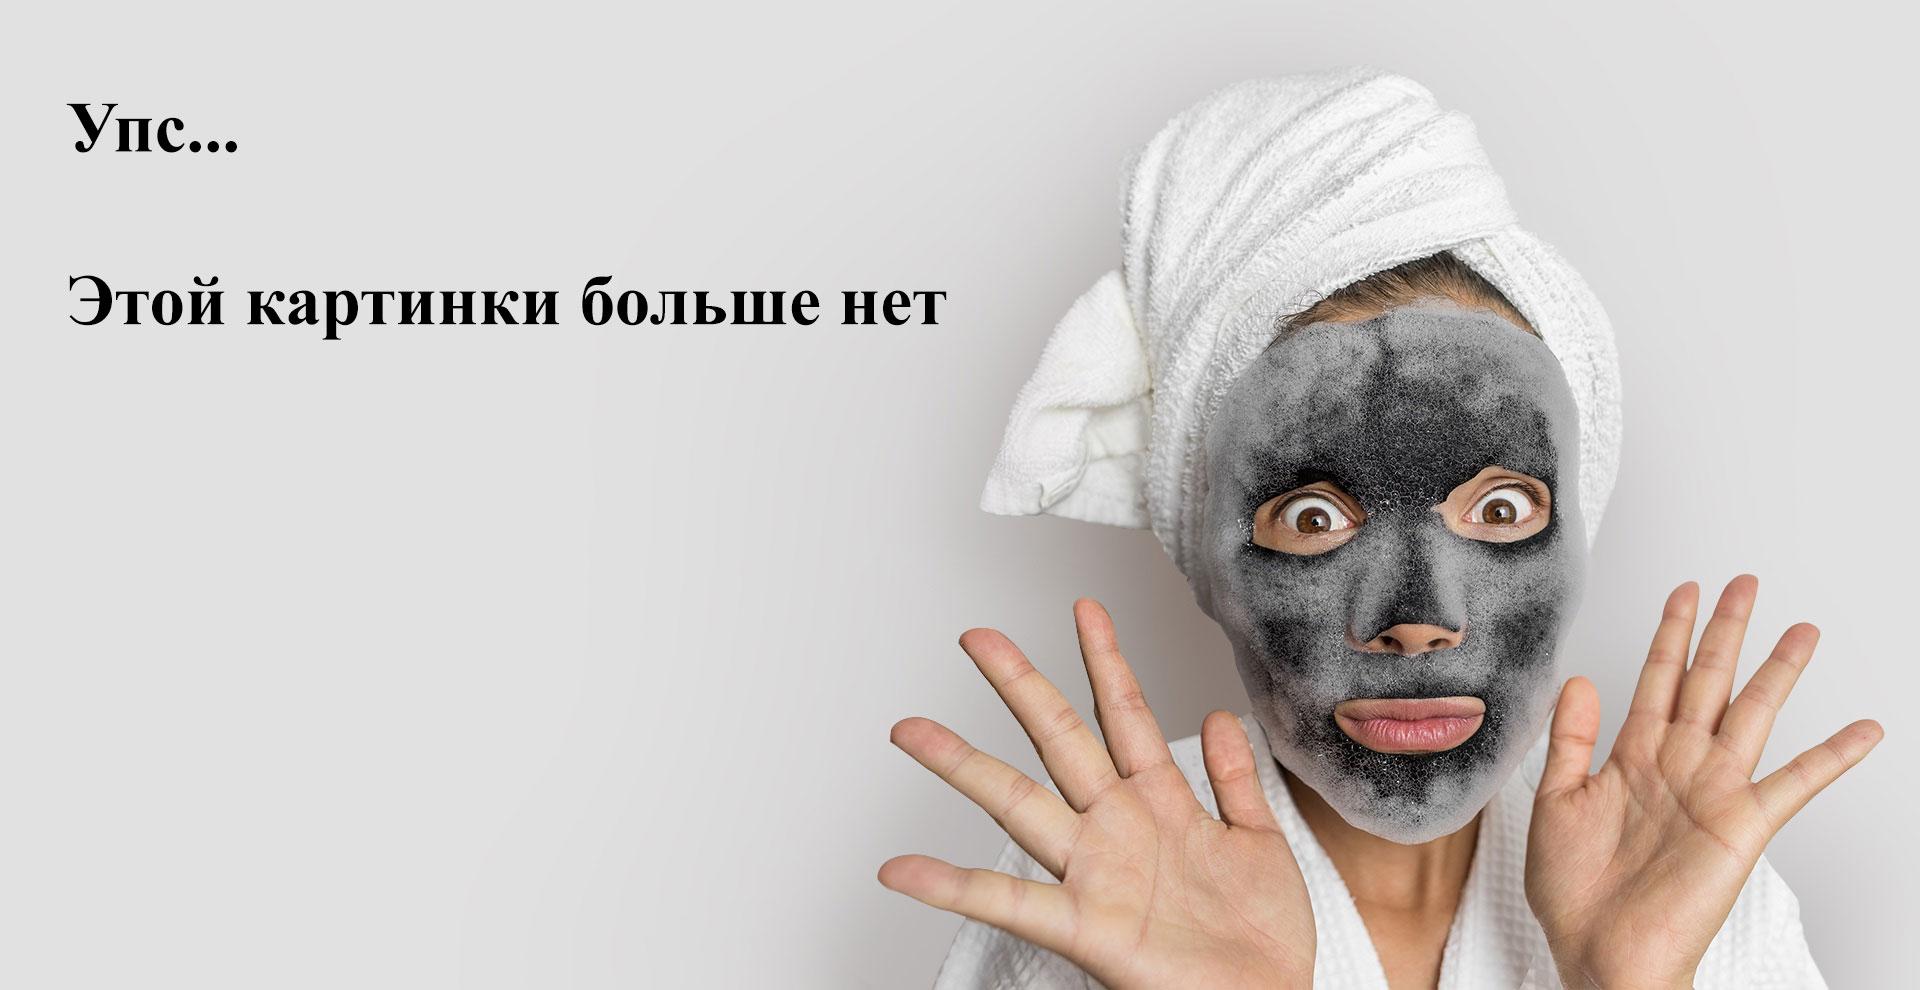 DR.GLODERM, Мист-спрей для лица CEQRX Derma Fense, 140 мл